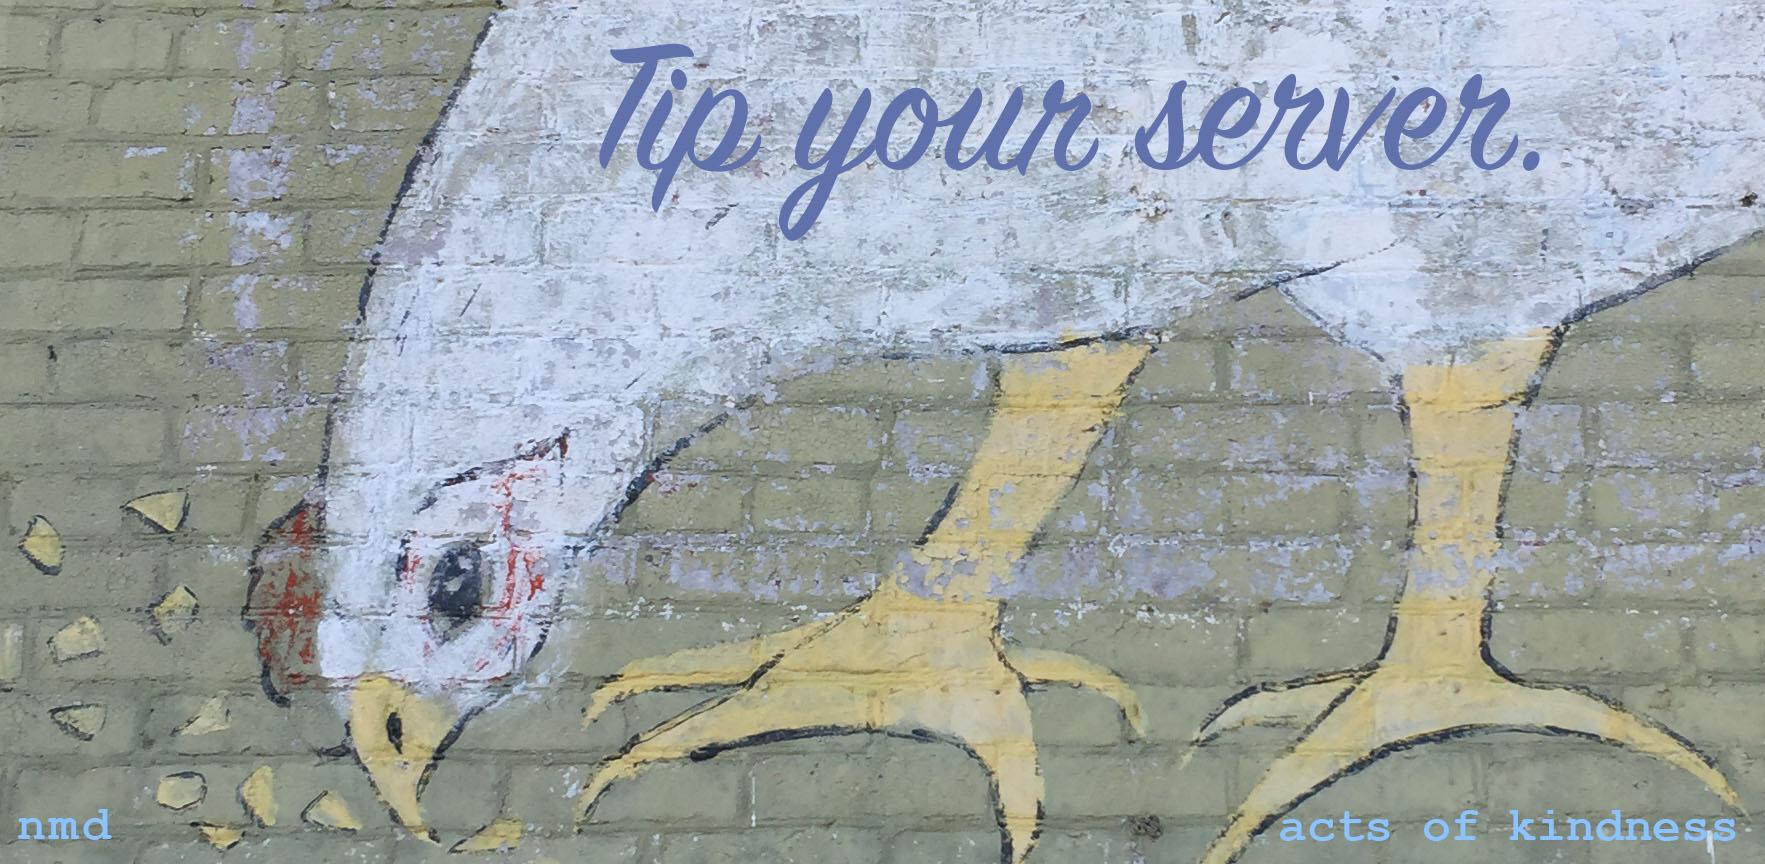 tip your serverb